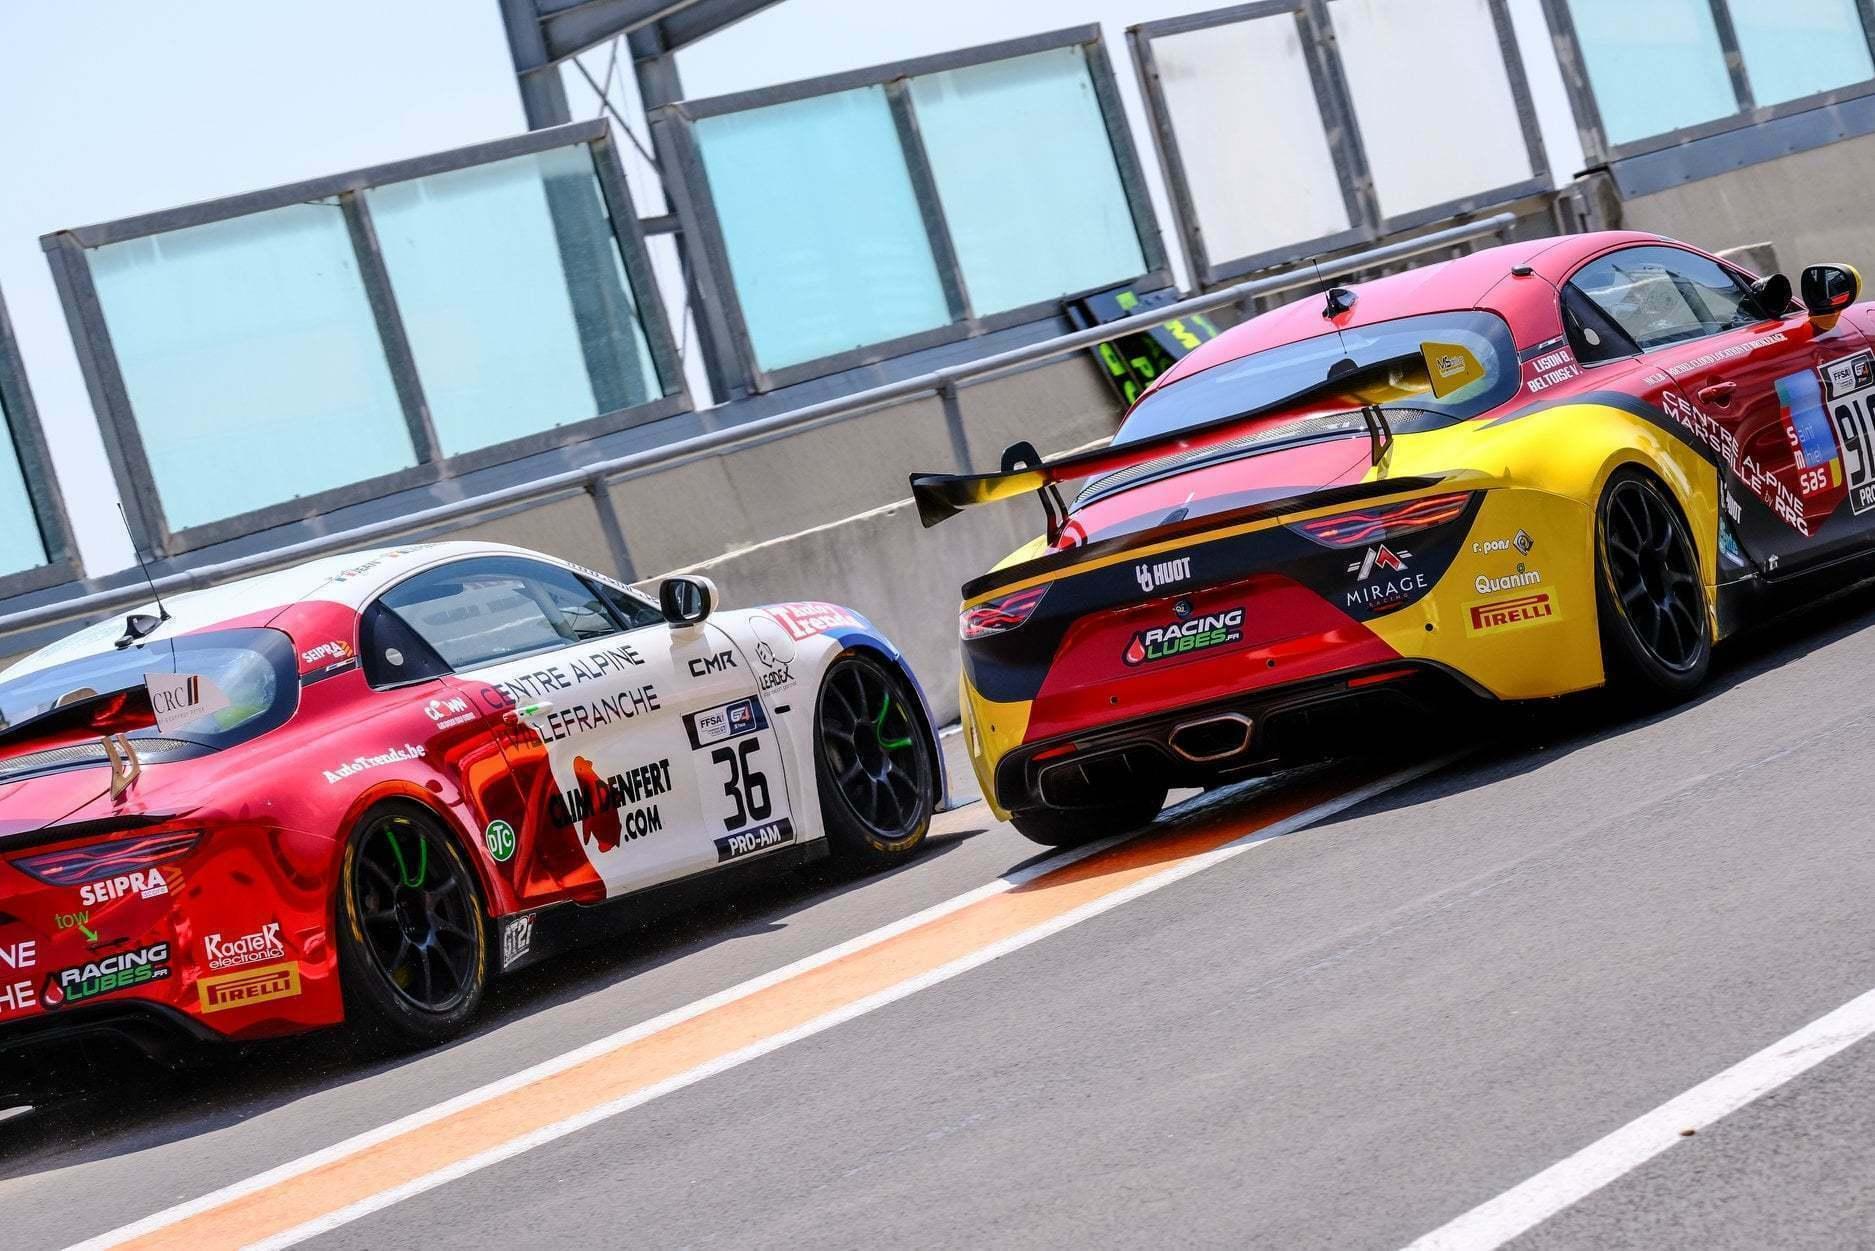 FFSA GT: CMR reprend la main Lédenon ! (Course 2) 1